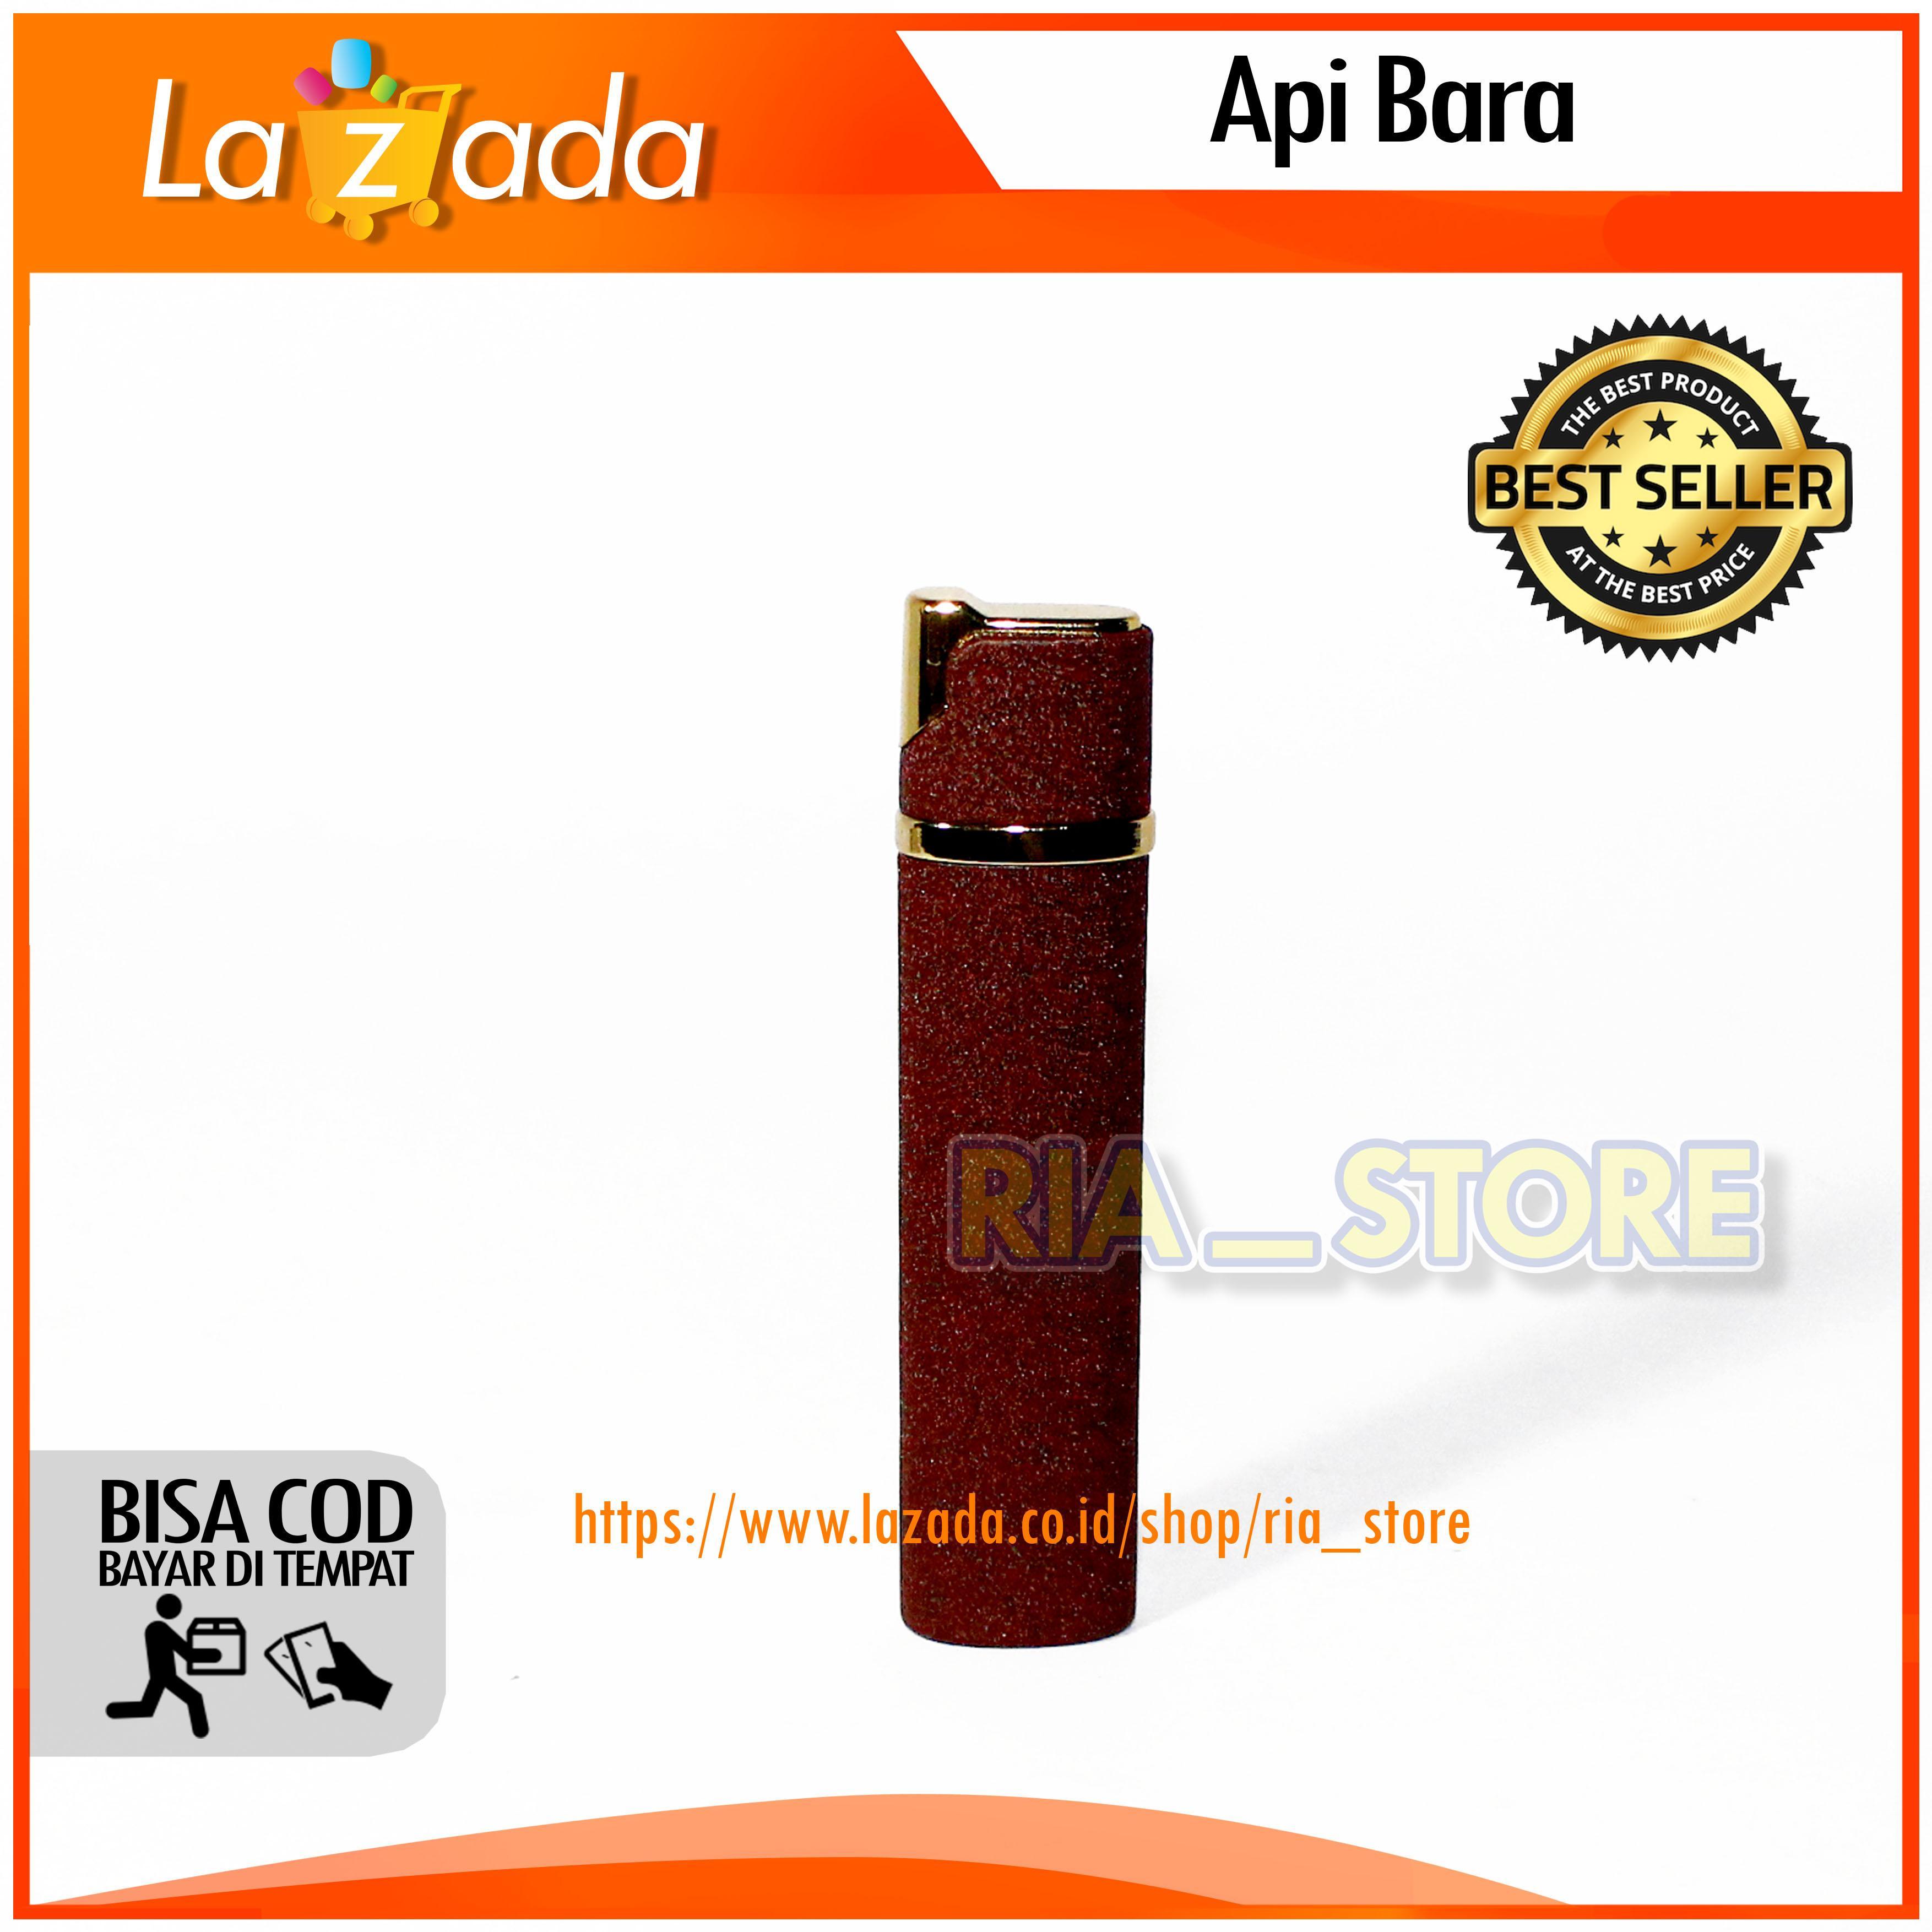 Korek Api Model Teling Slim 3628 Red Maroon, Korek Api Exclusive, Korek Bara Unik